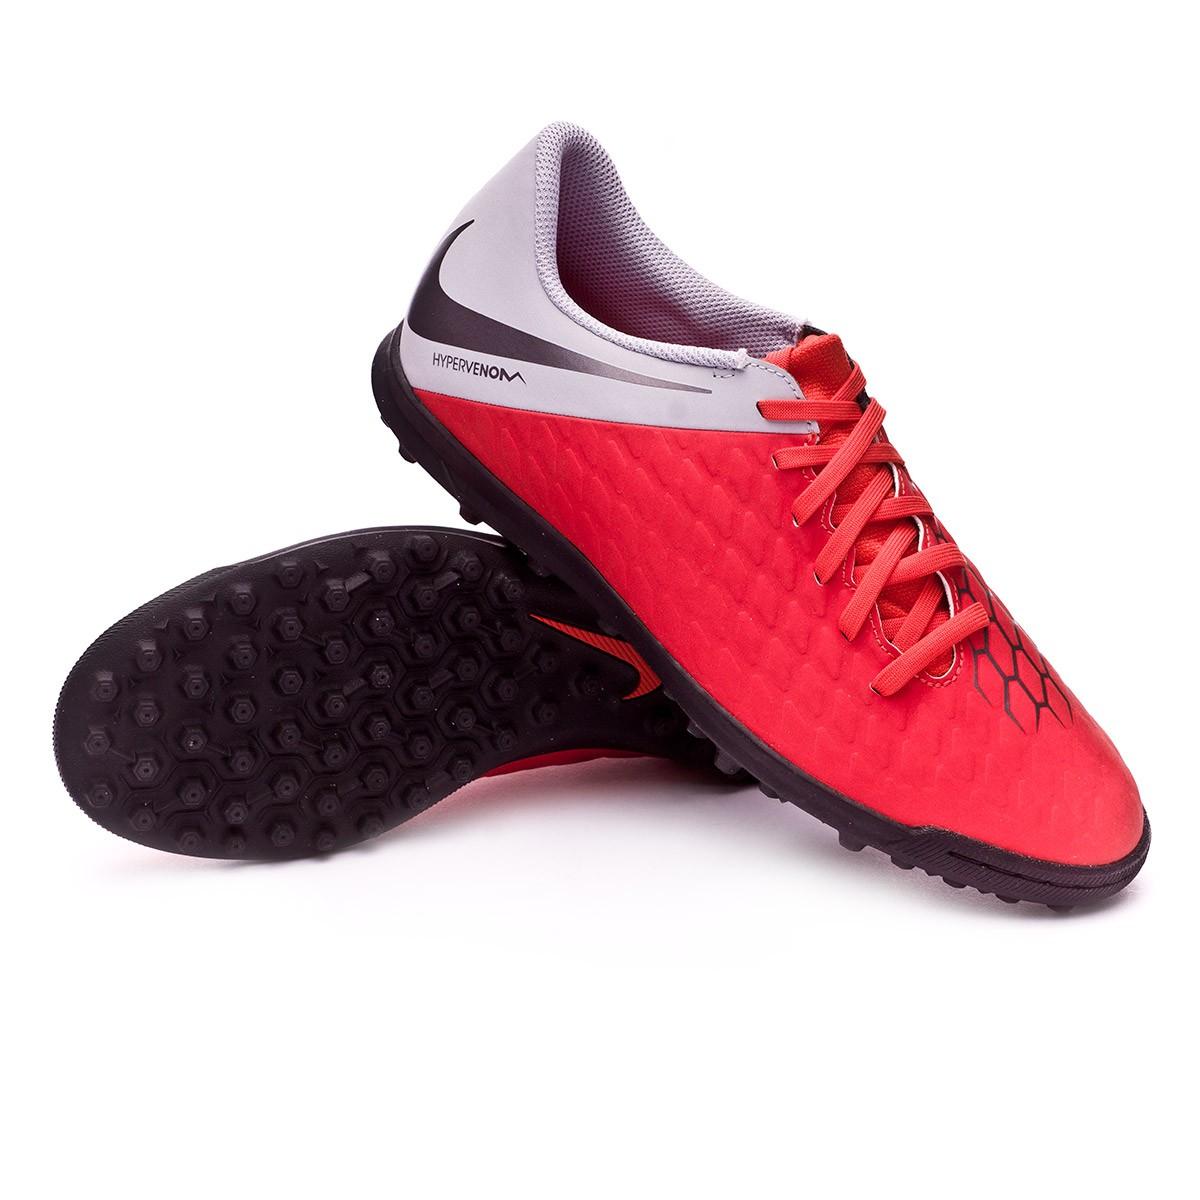 2699c5497619 Nike Hypervenom III Club Turf Football Boot. Light crimson-Metallic dark  grey-Wolf grey reference no.